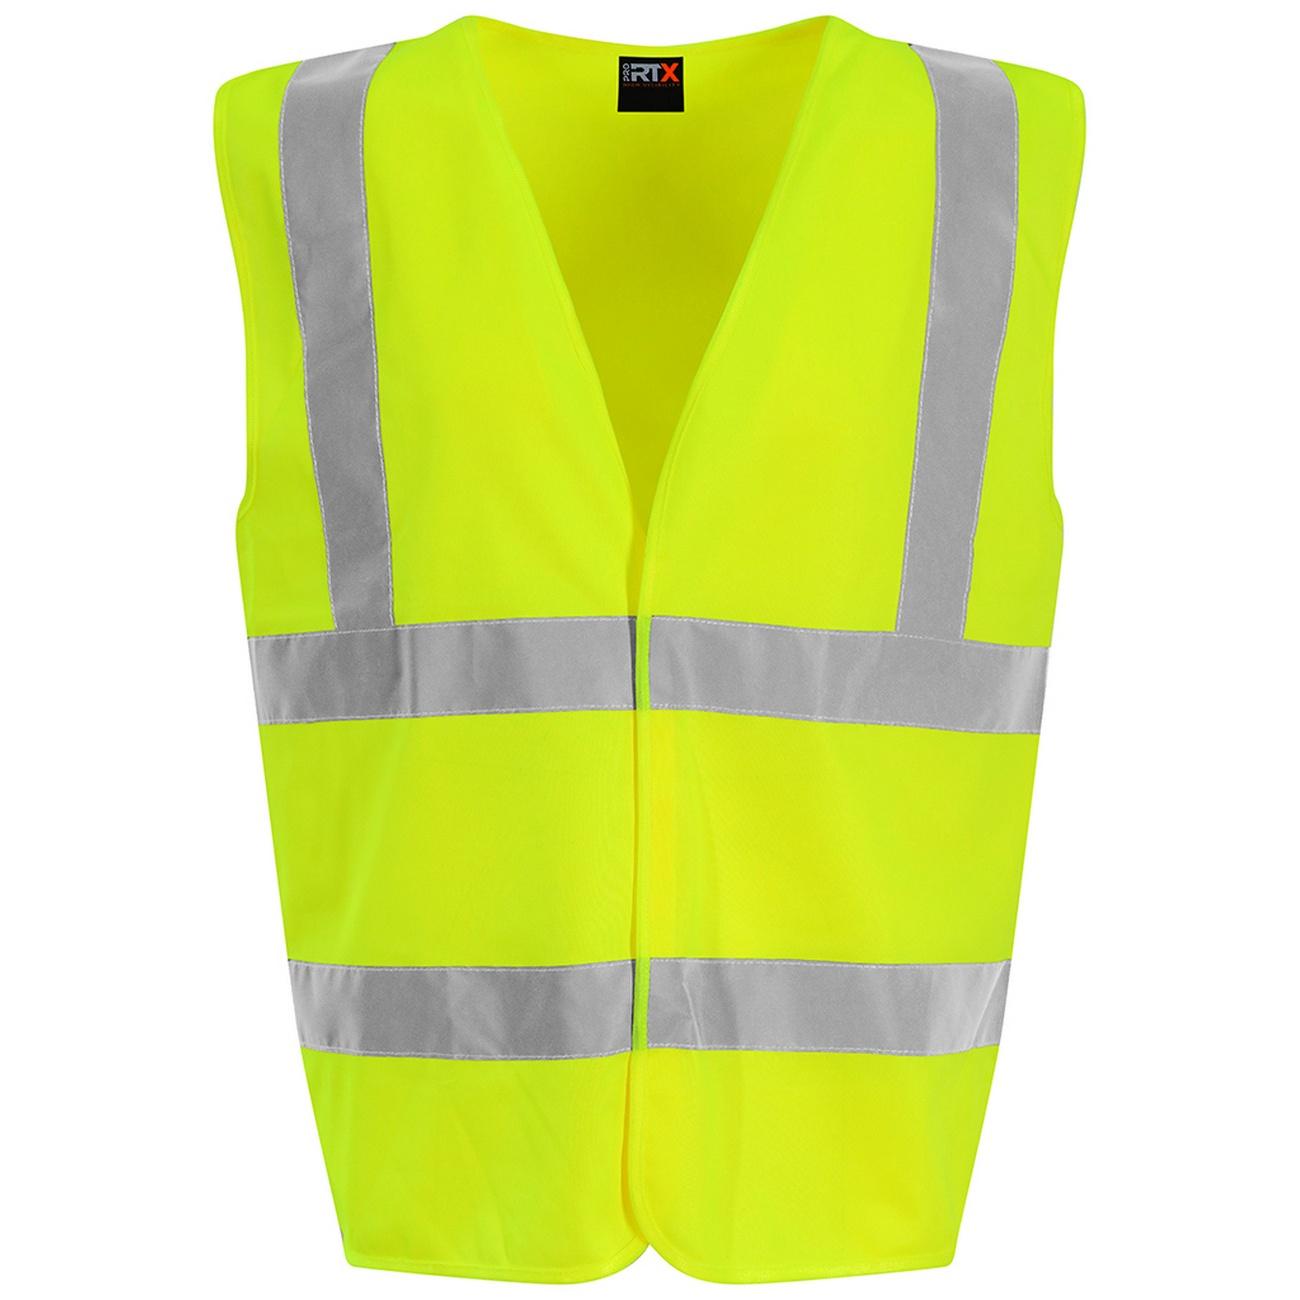 PRO RTX High Visibility Unisex Waistcoat (4XL) (Yellow)